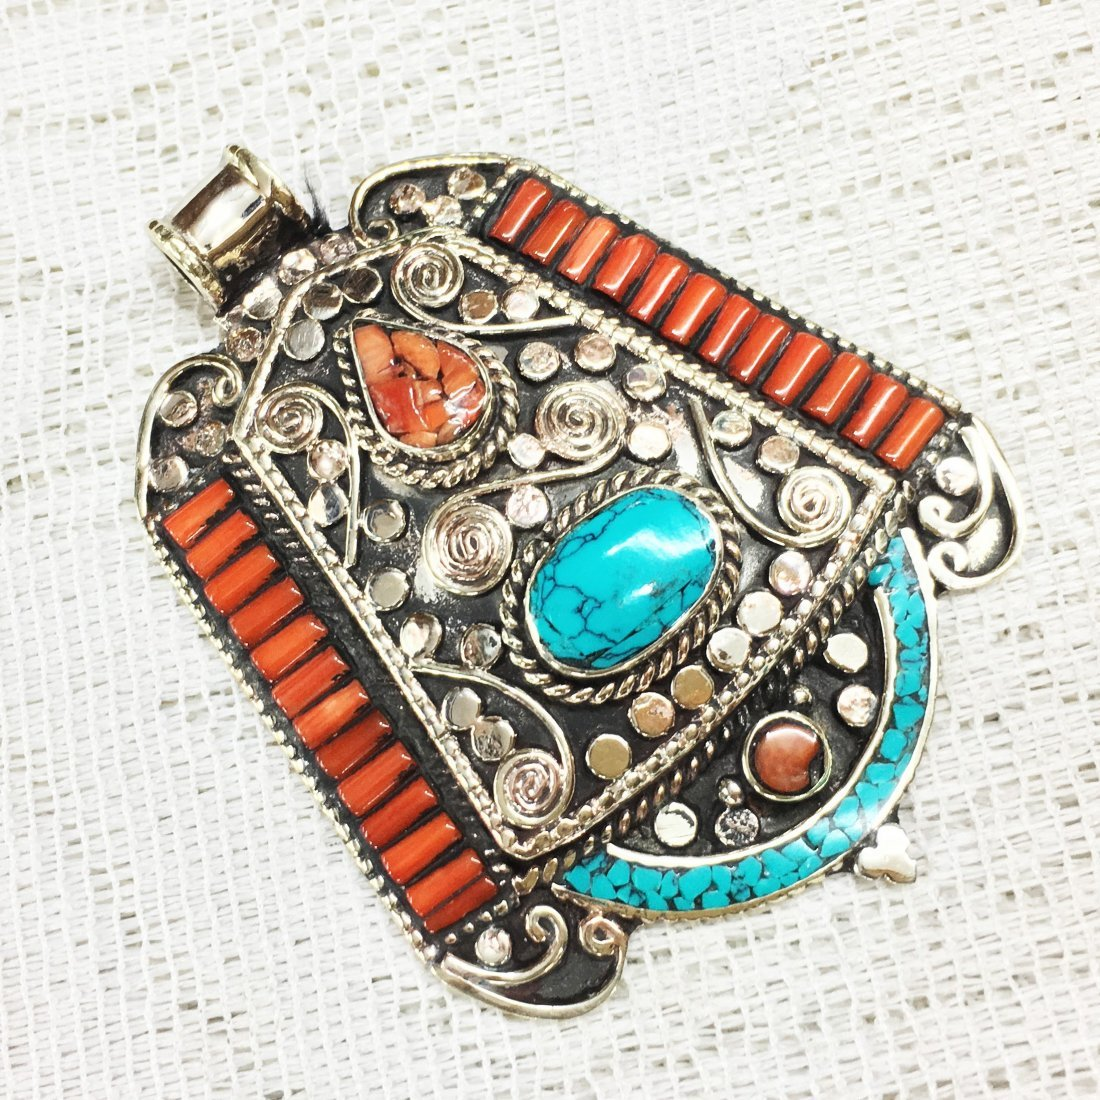 Bohemia Antique Tibetan Silver Pendant